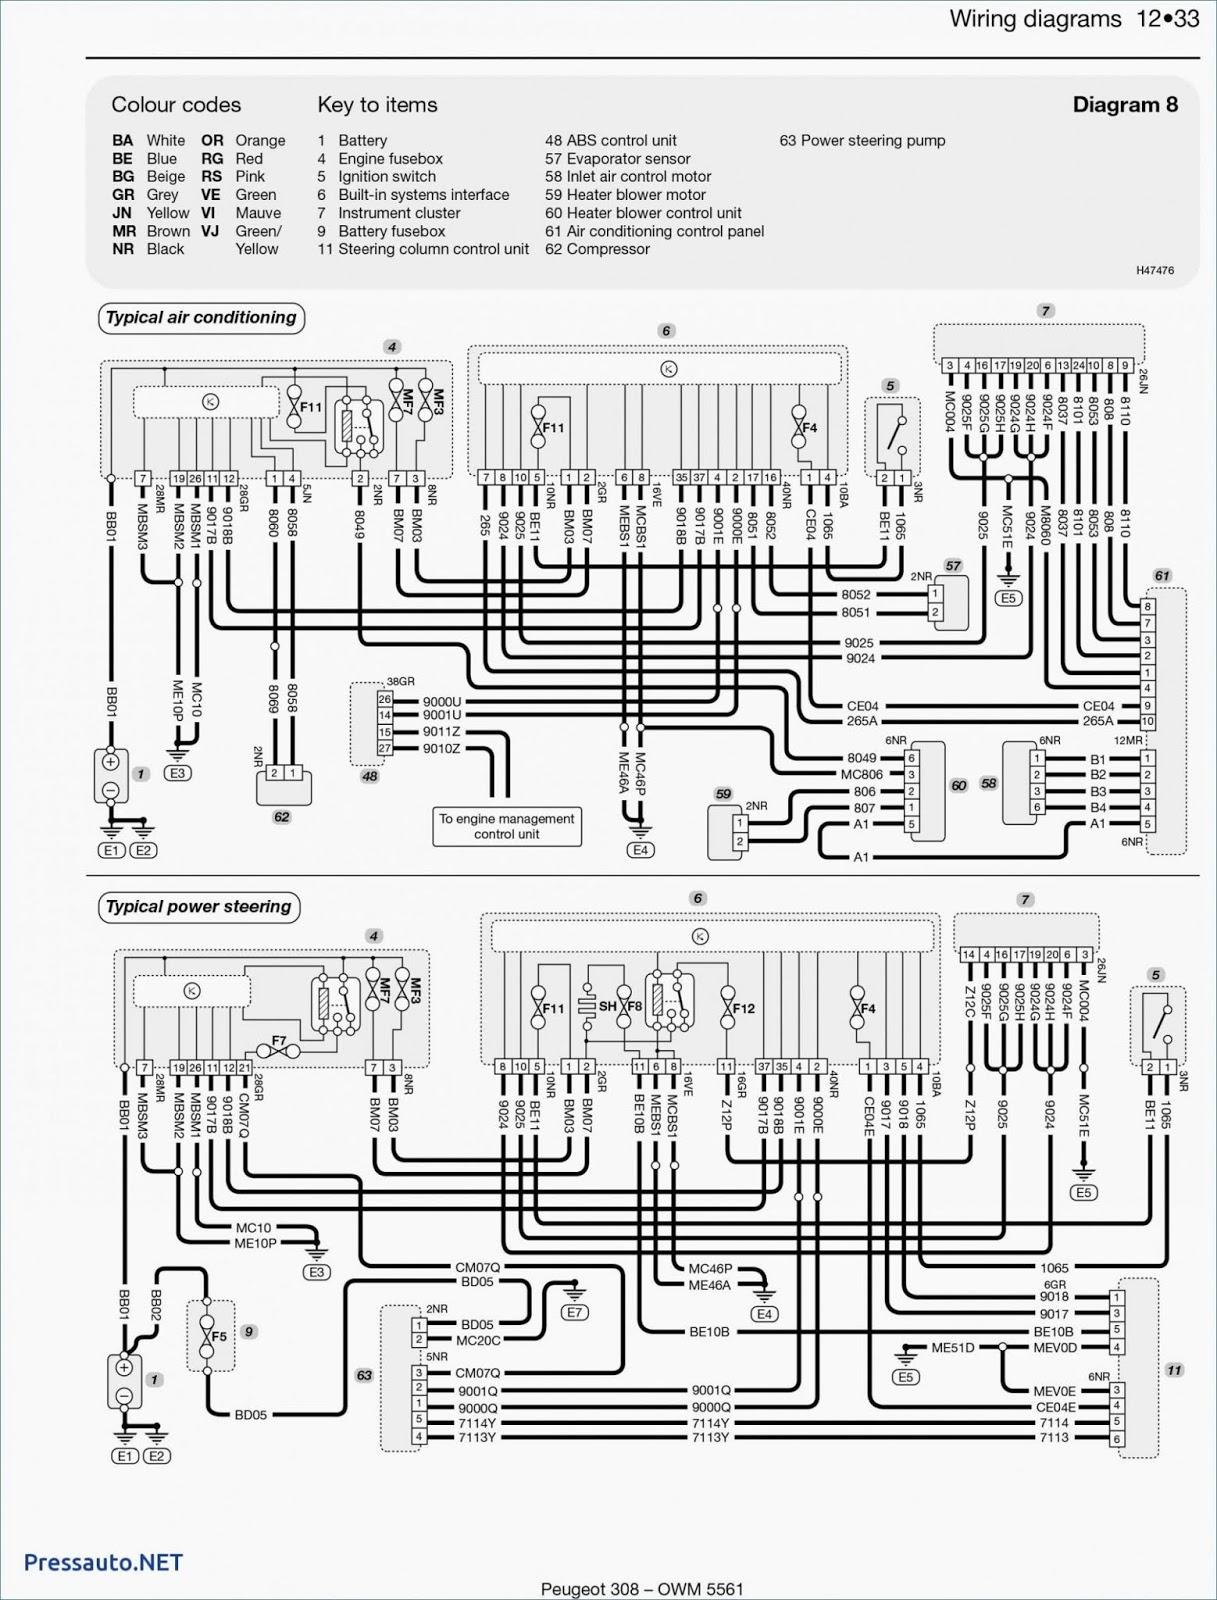 Engine Wiring Diagram Peugeot 8 Zet